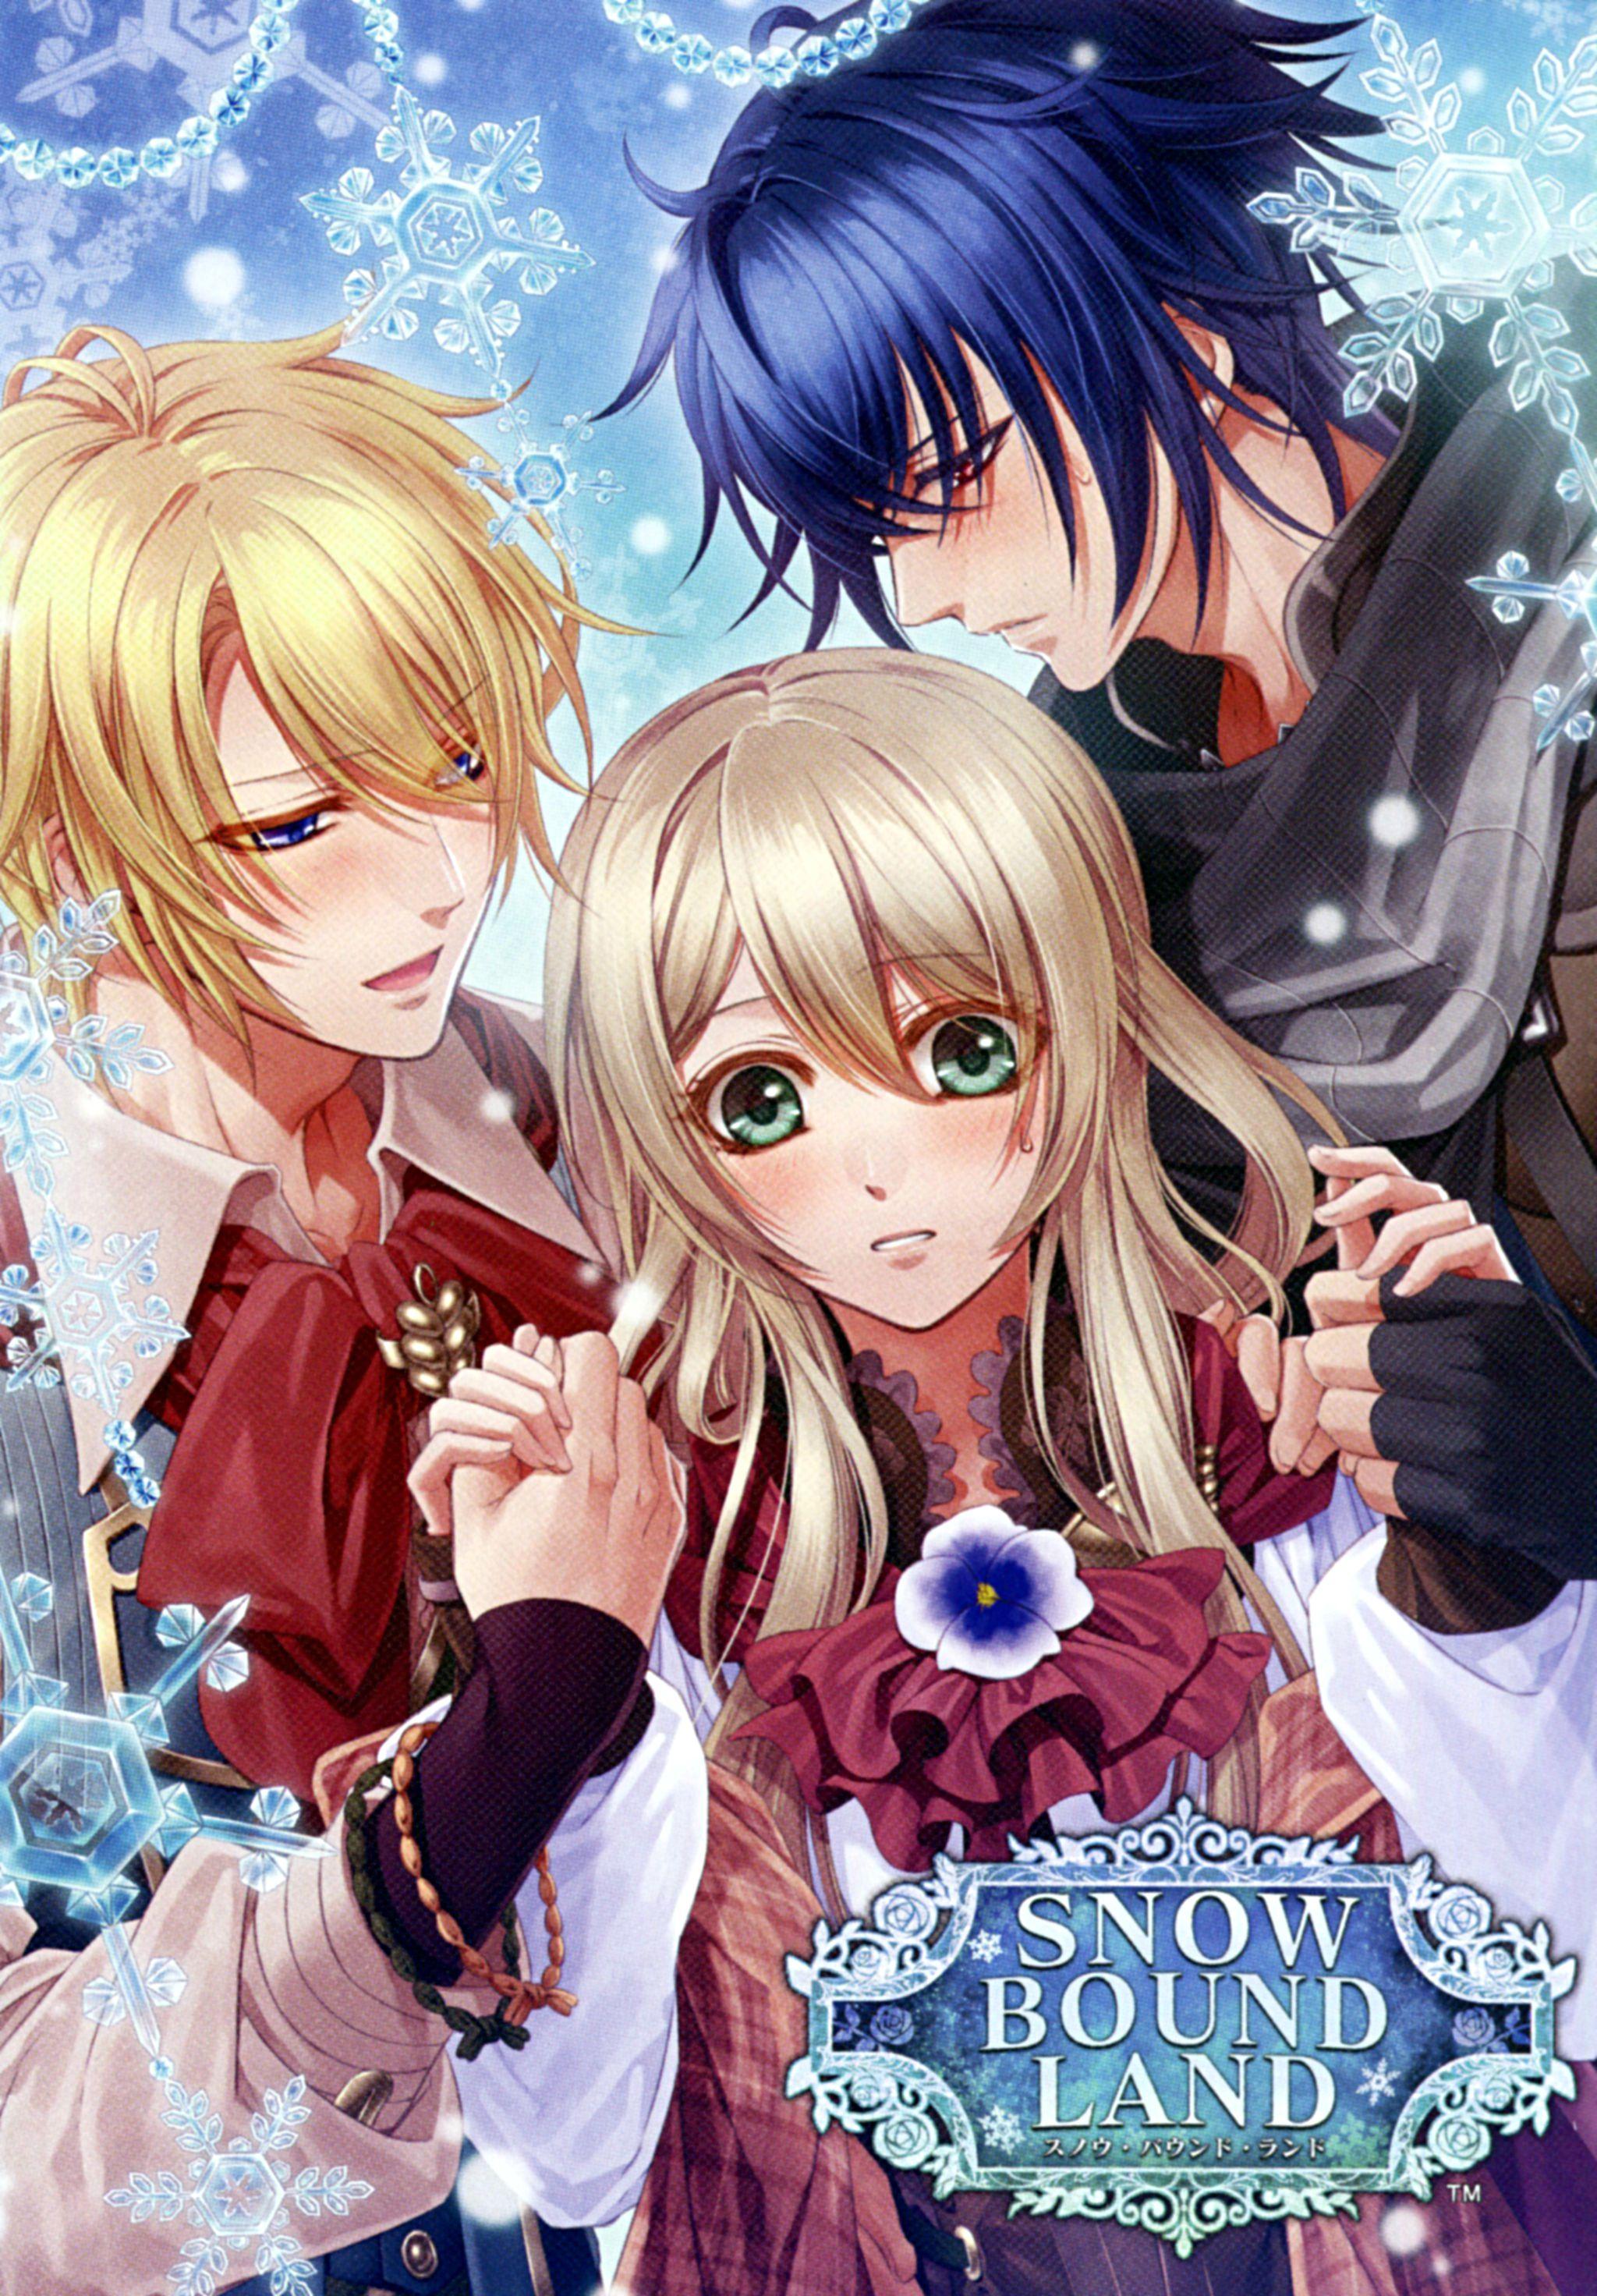 SNOW BOUND LAND/1643480 Zerochan Anime romance, Anime